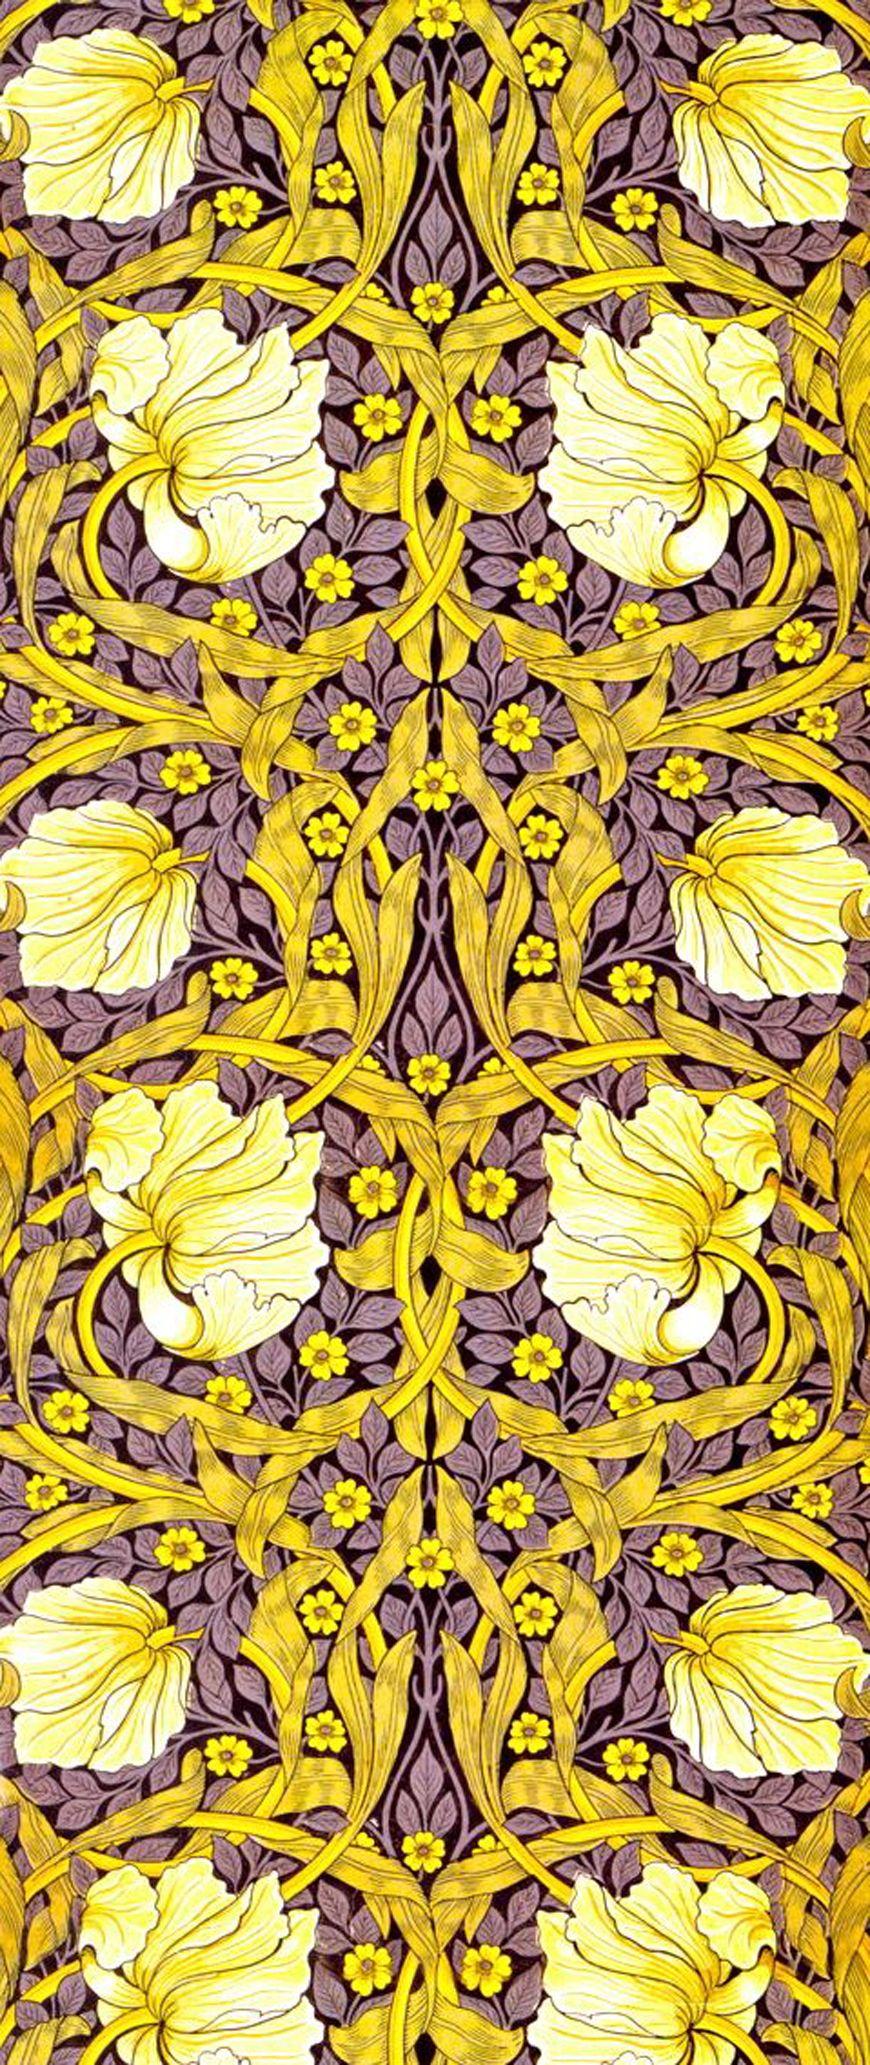 Purple & yellow   prints   Pinterest   William morris, Prints and ...